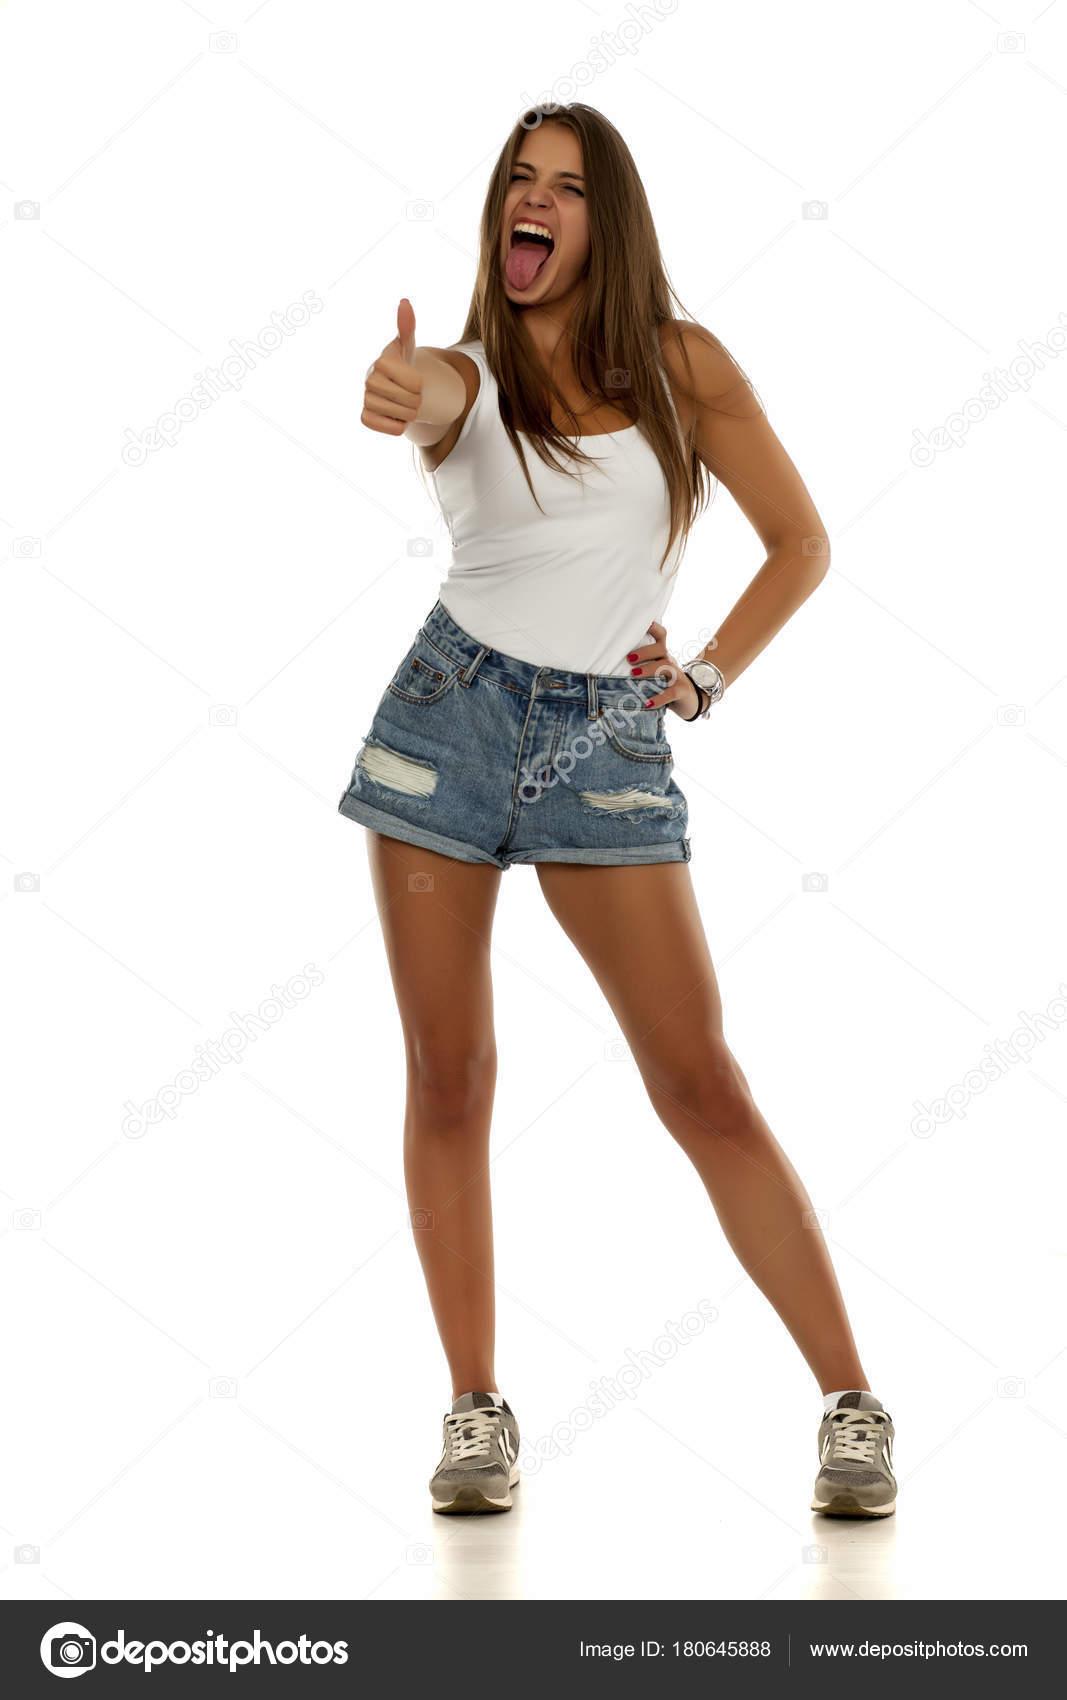 Camisa Mujer Zapatillas Jeans Deporte Mangas Joven Tonta Shorts Sin Tl3cFKu1J